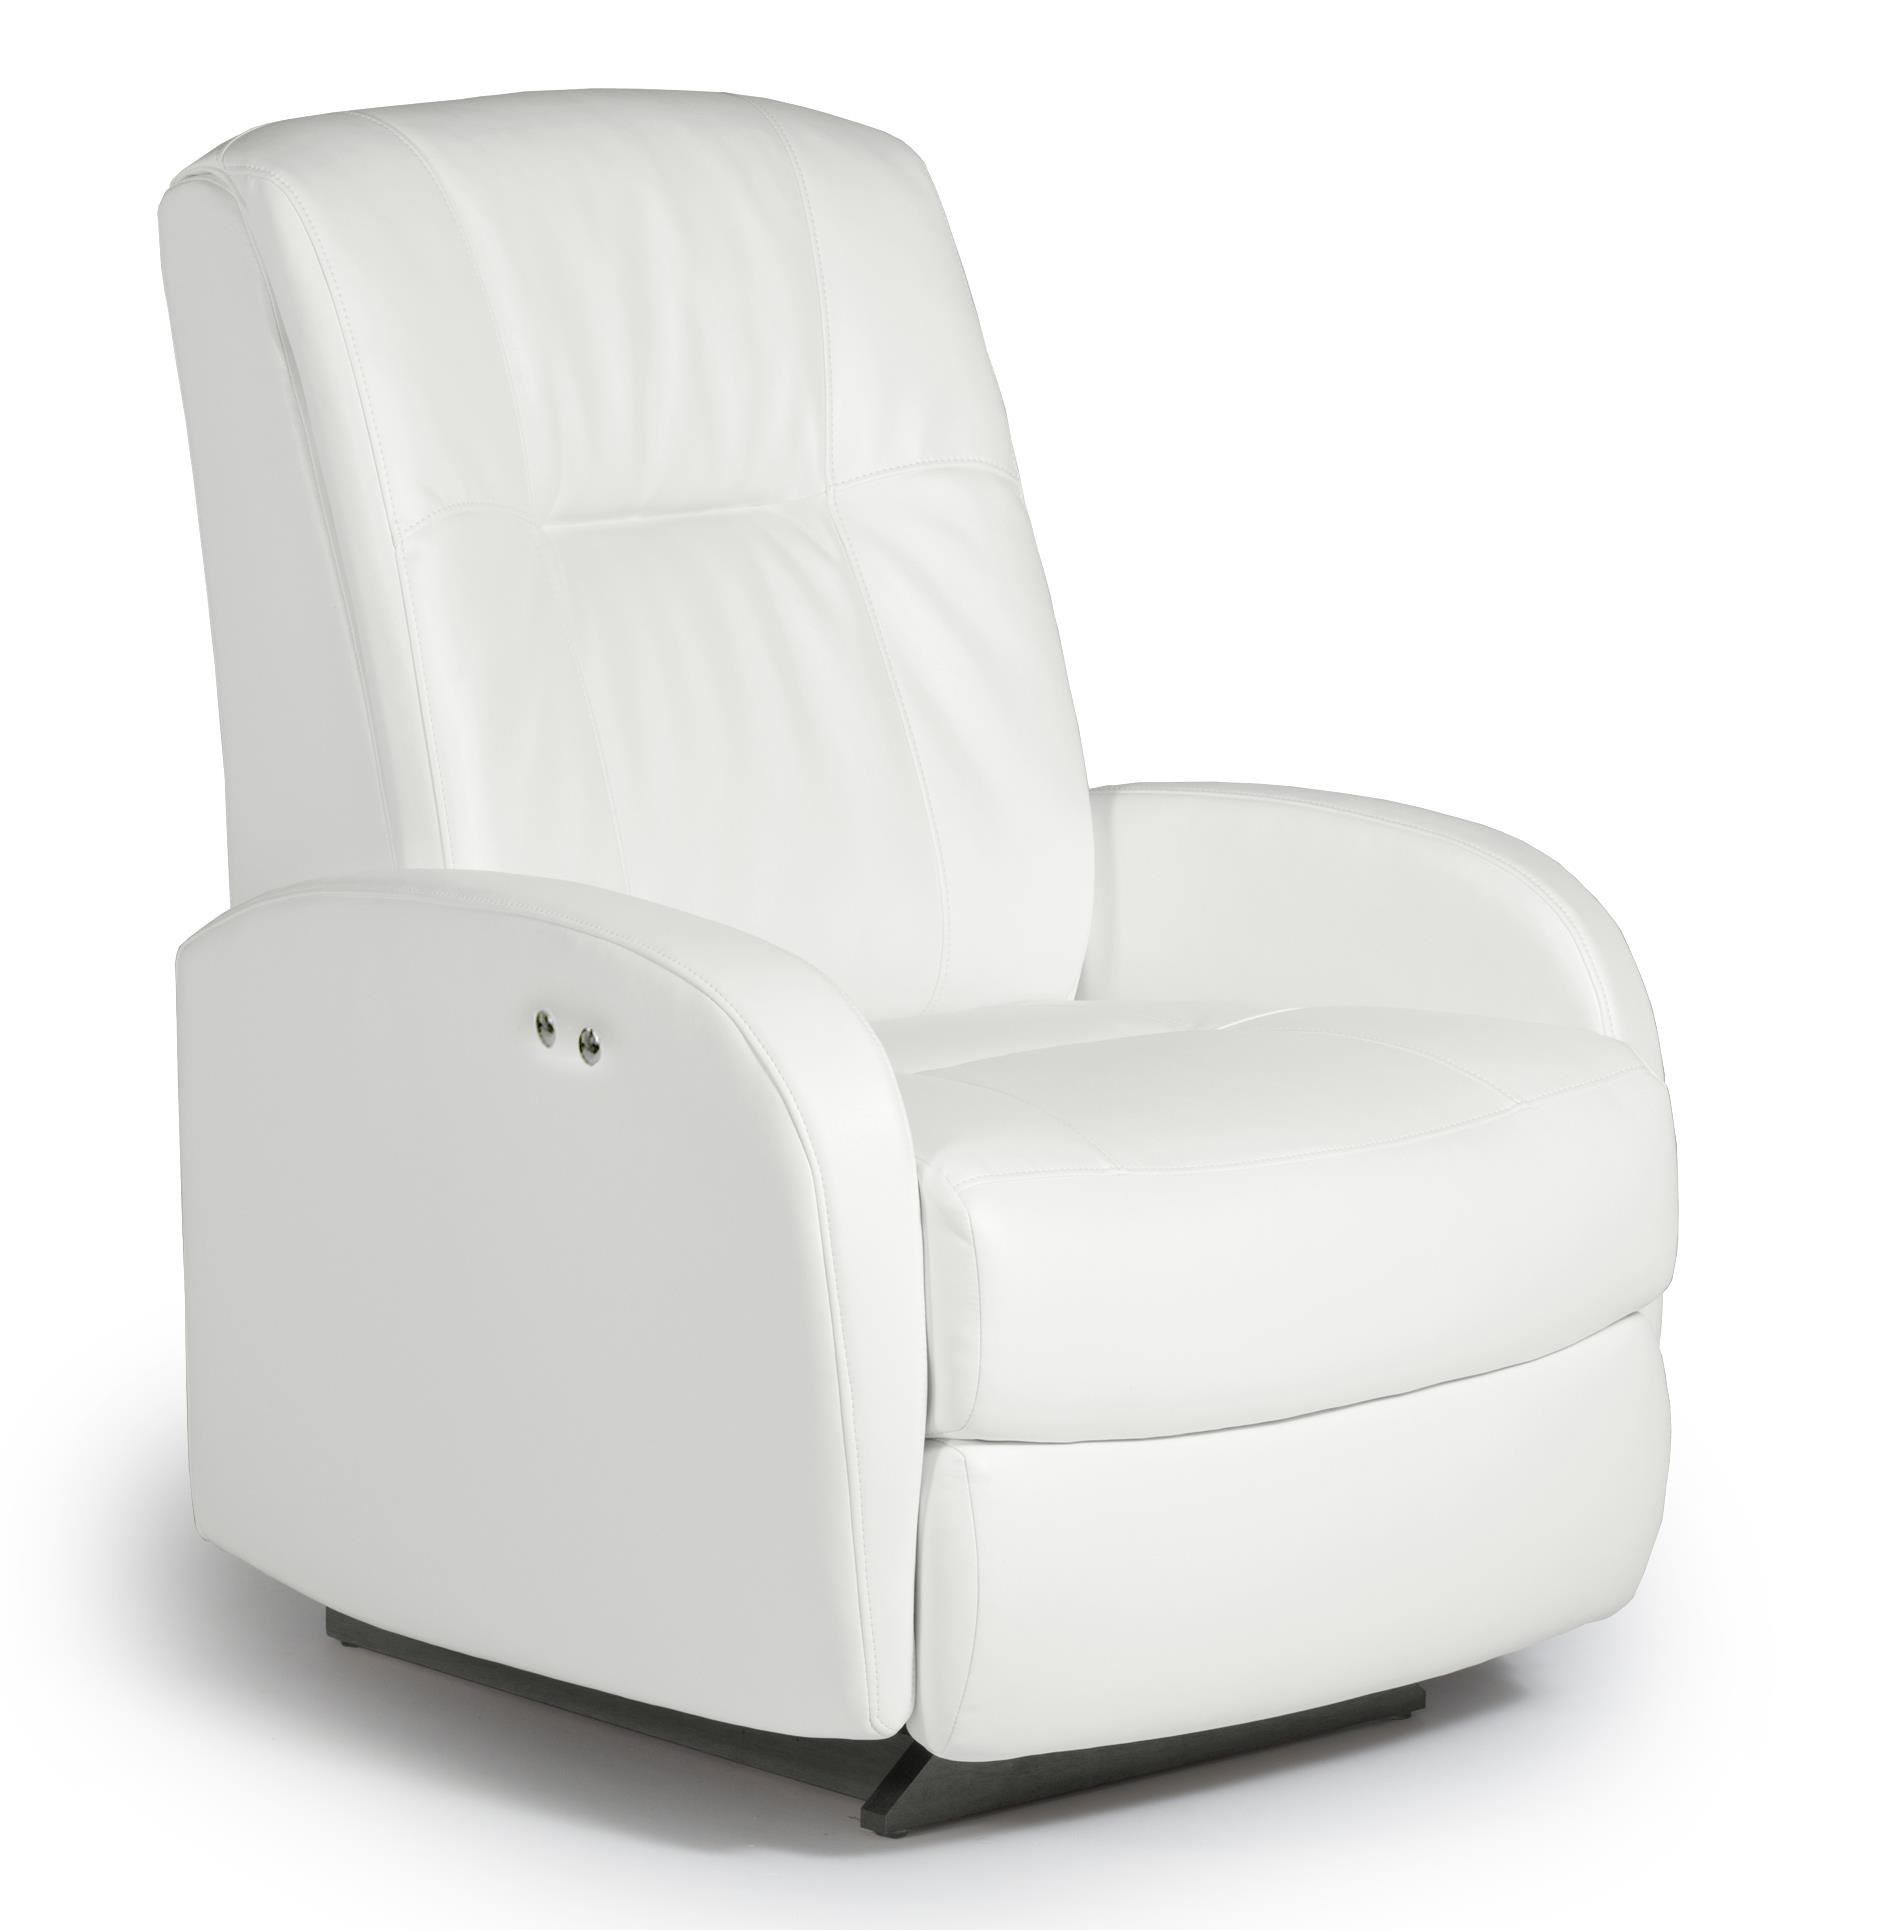 Best Chairs Storytime Series Storytime Recliners Ruddick Swivel Rocker  Recliner